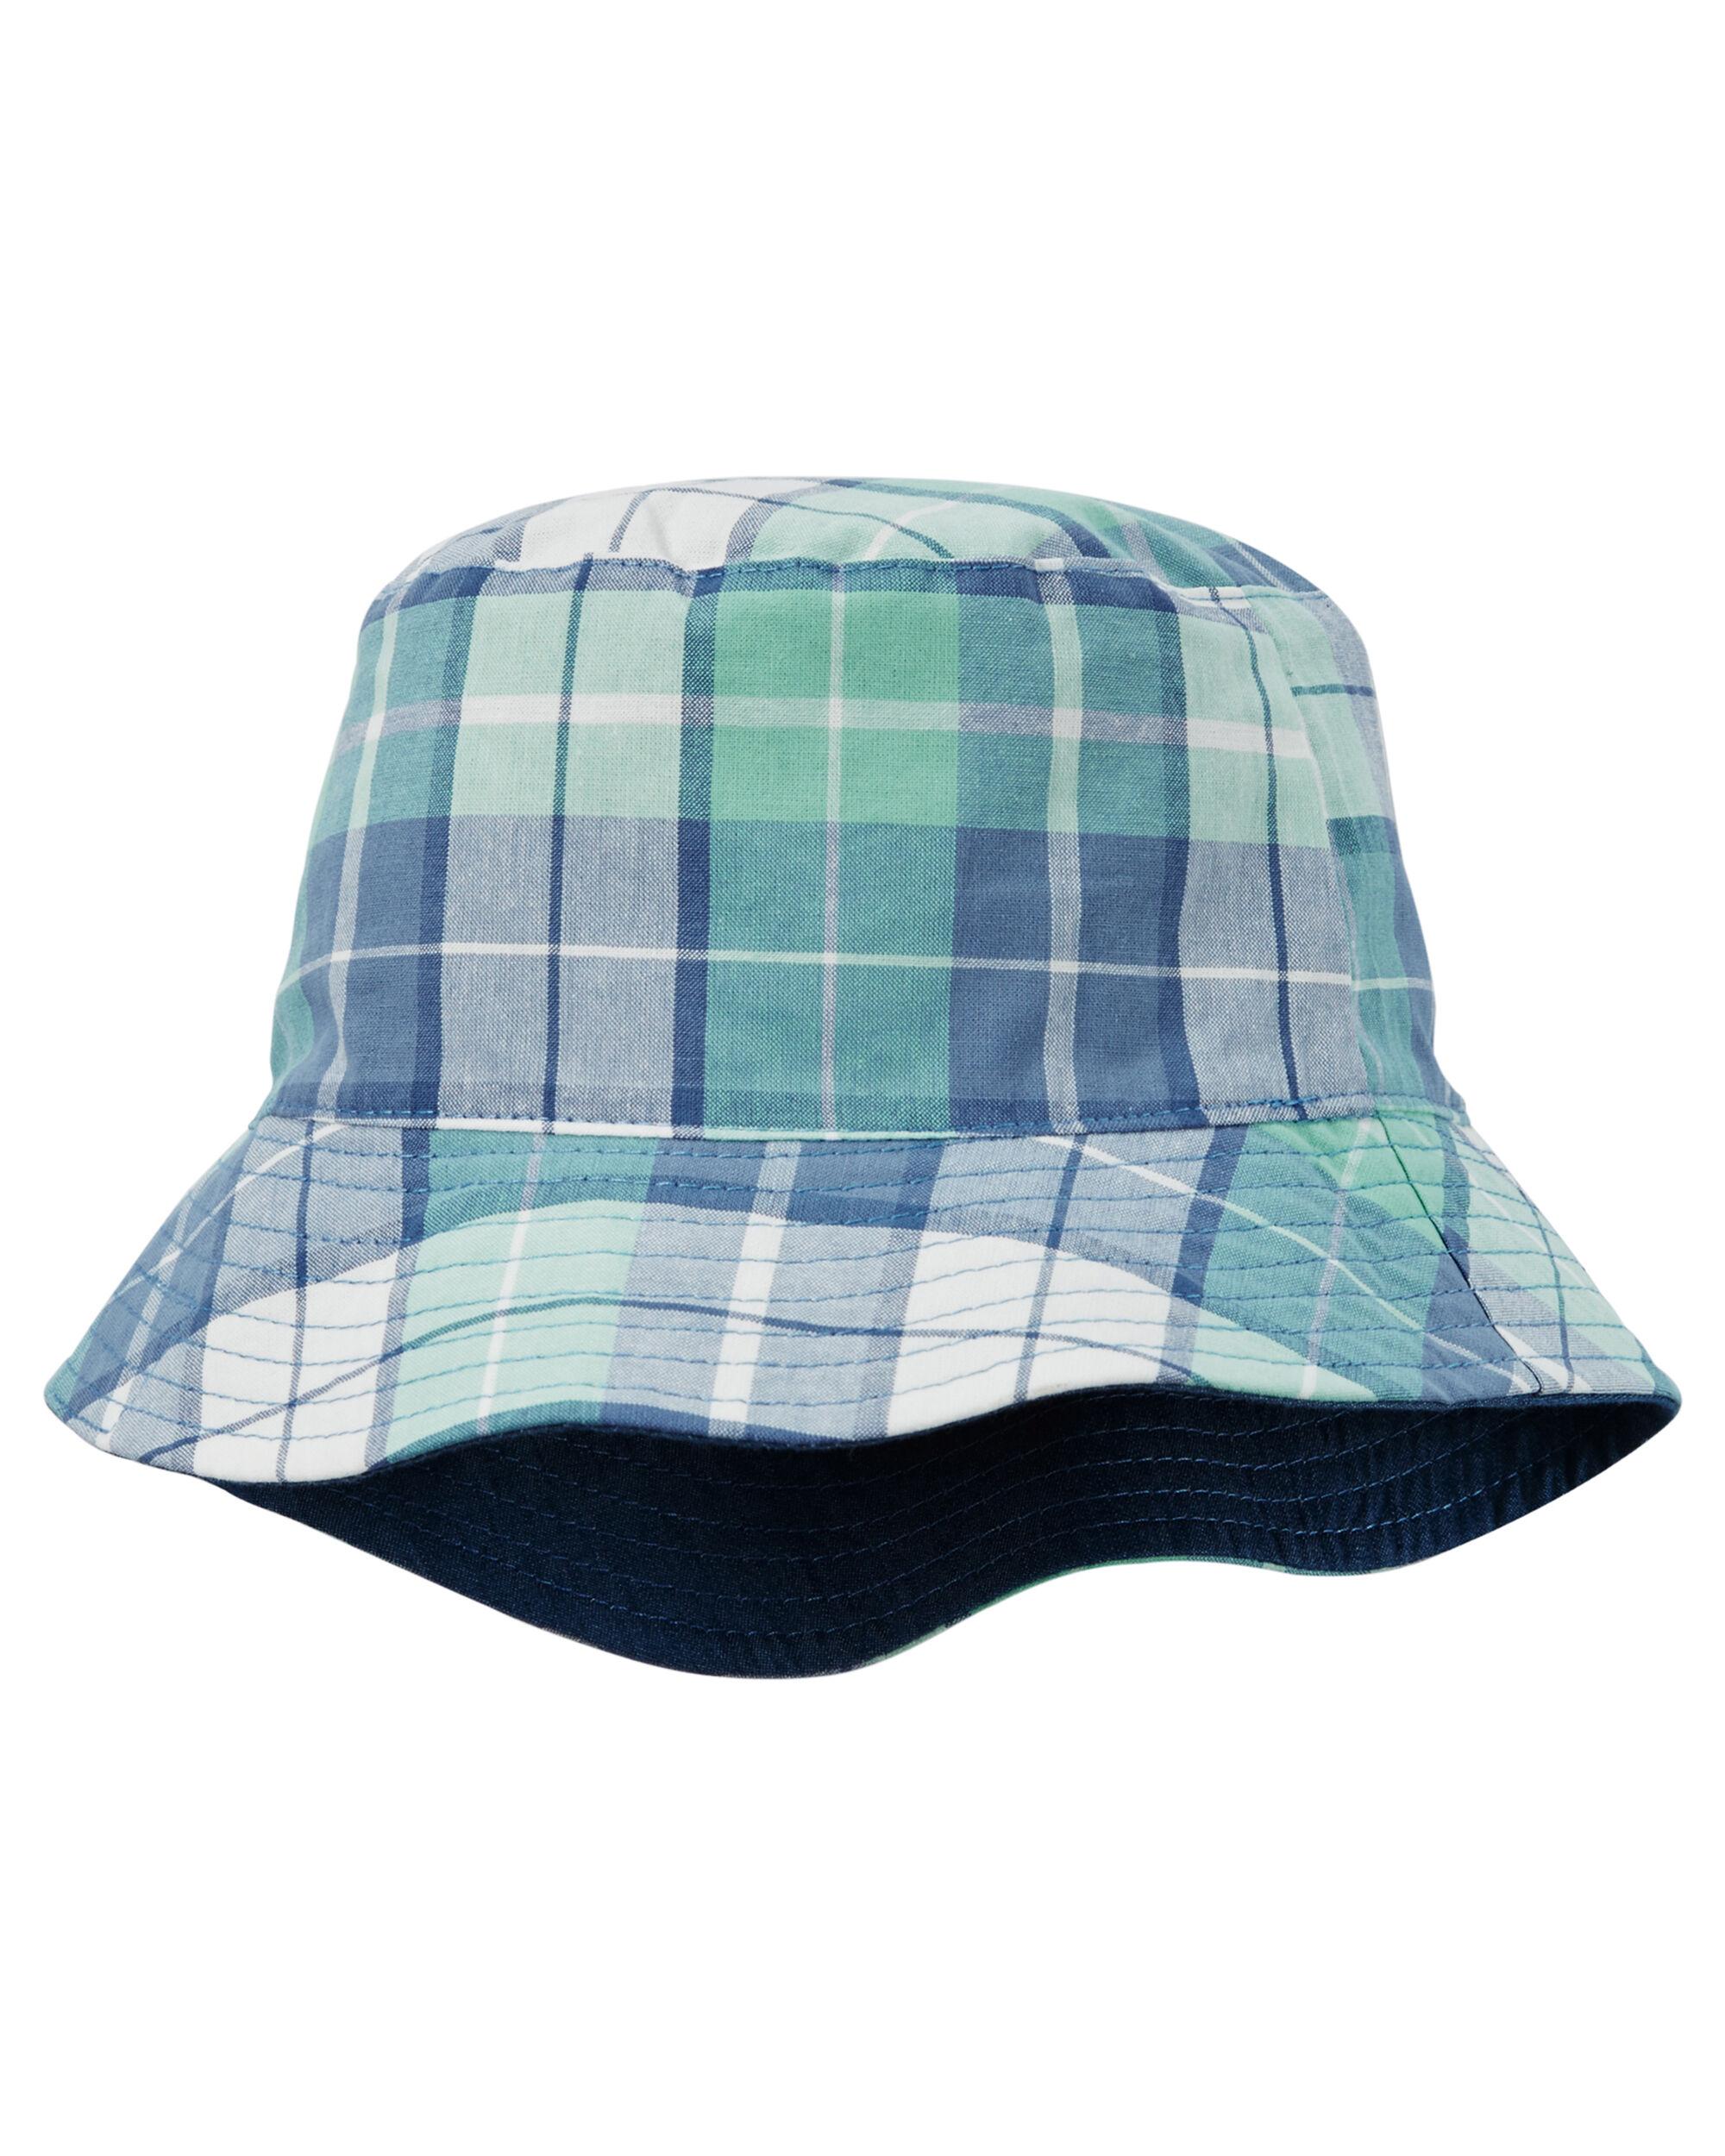 05f1d3c985e04 Reversible Chambray Bucket Hat · Reversible Chambray Bucket Hat